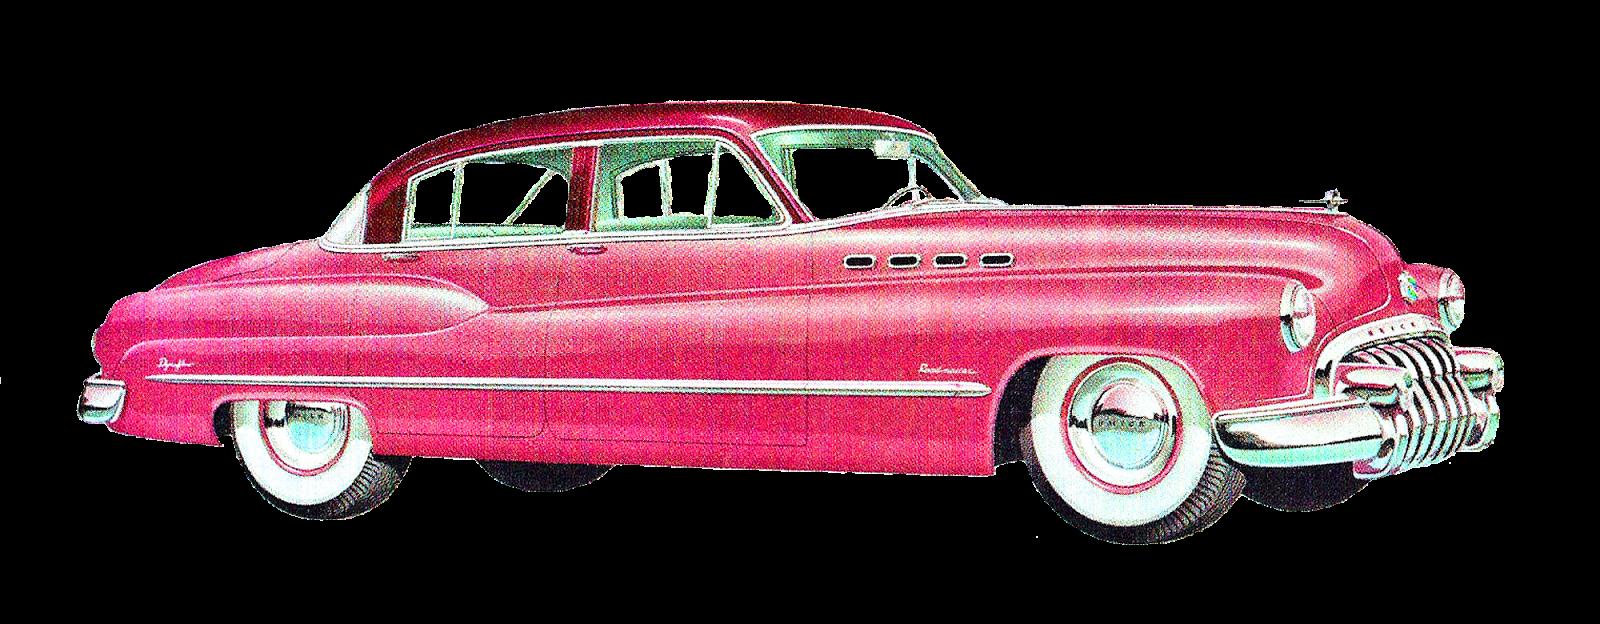 Car travel clipart image royalty free Antique Images: Vintage Old Car Artwork Illustrations Buick Dodge ... image royalty free